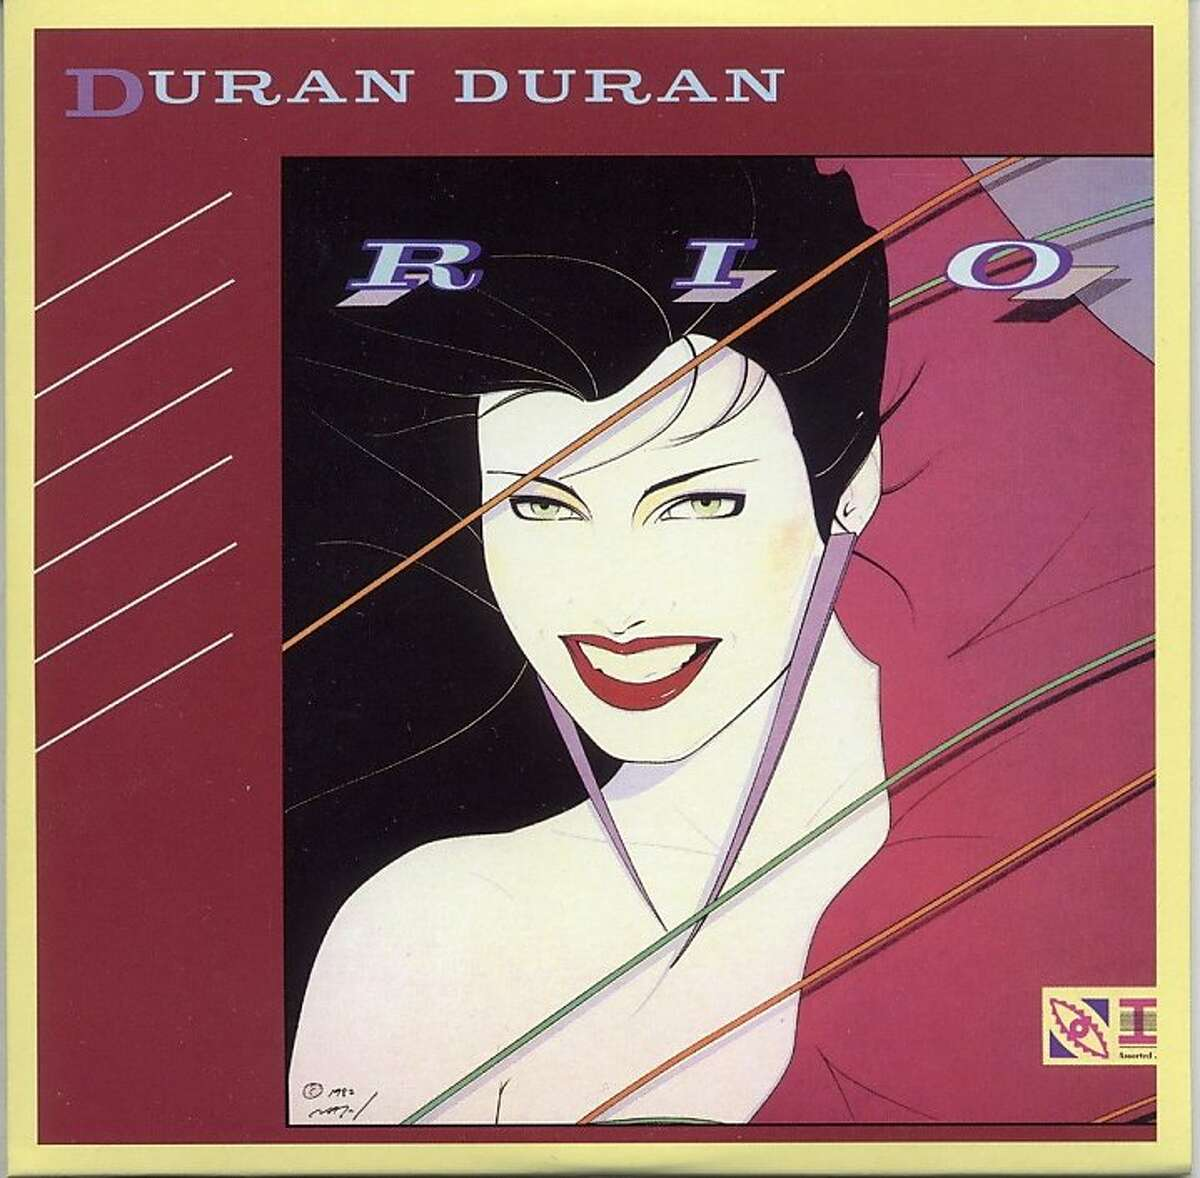 Duran Duran's